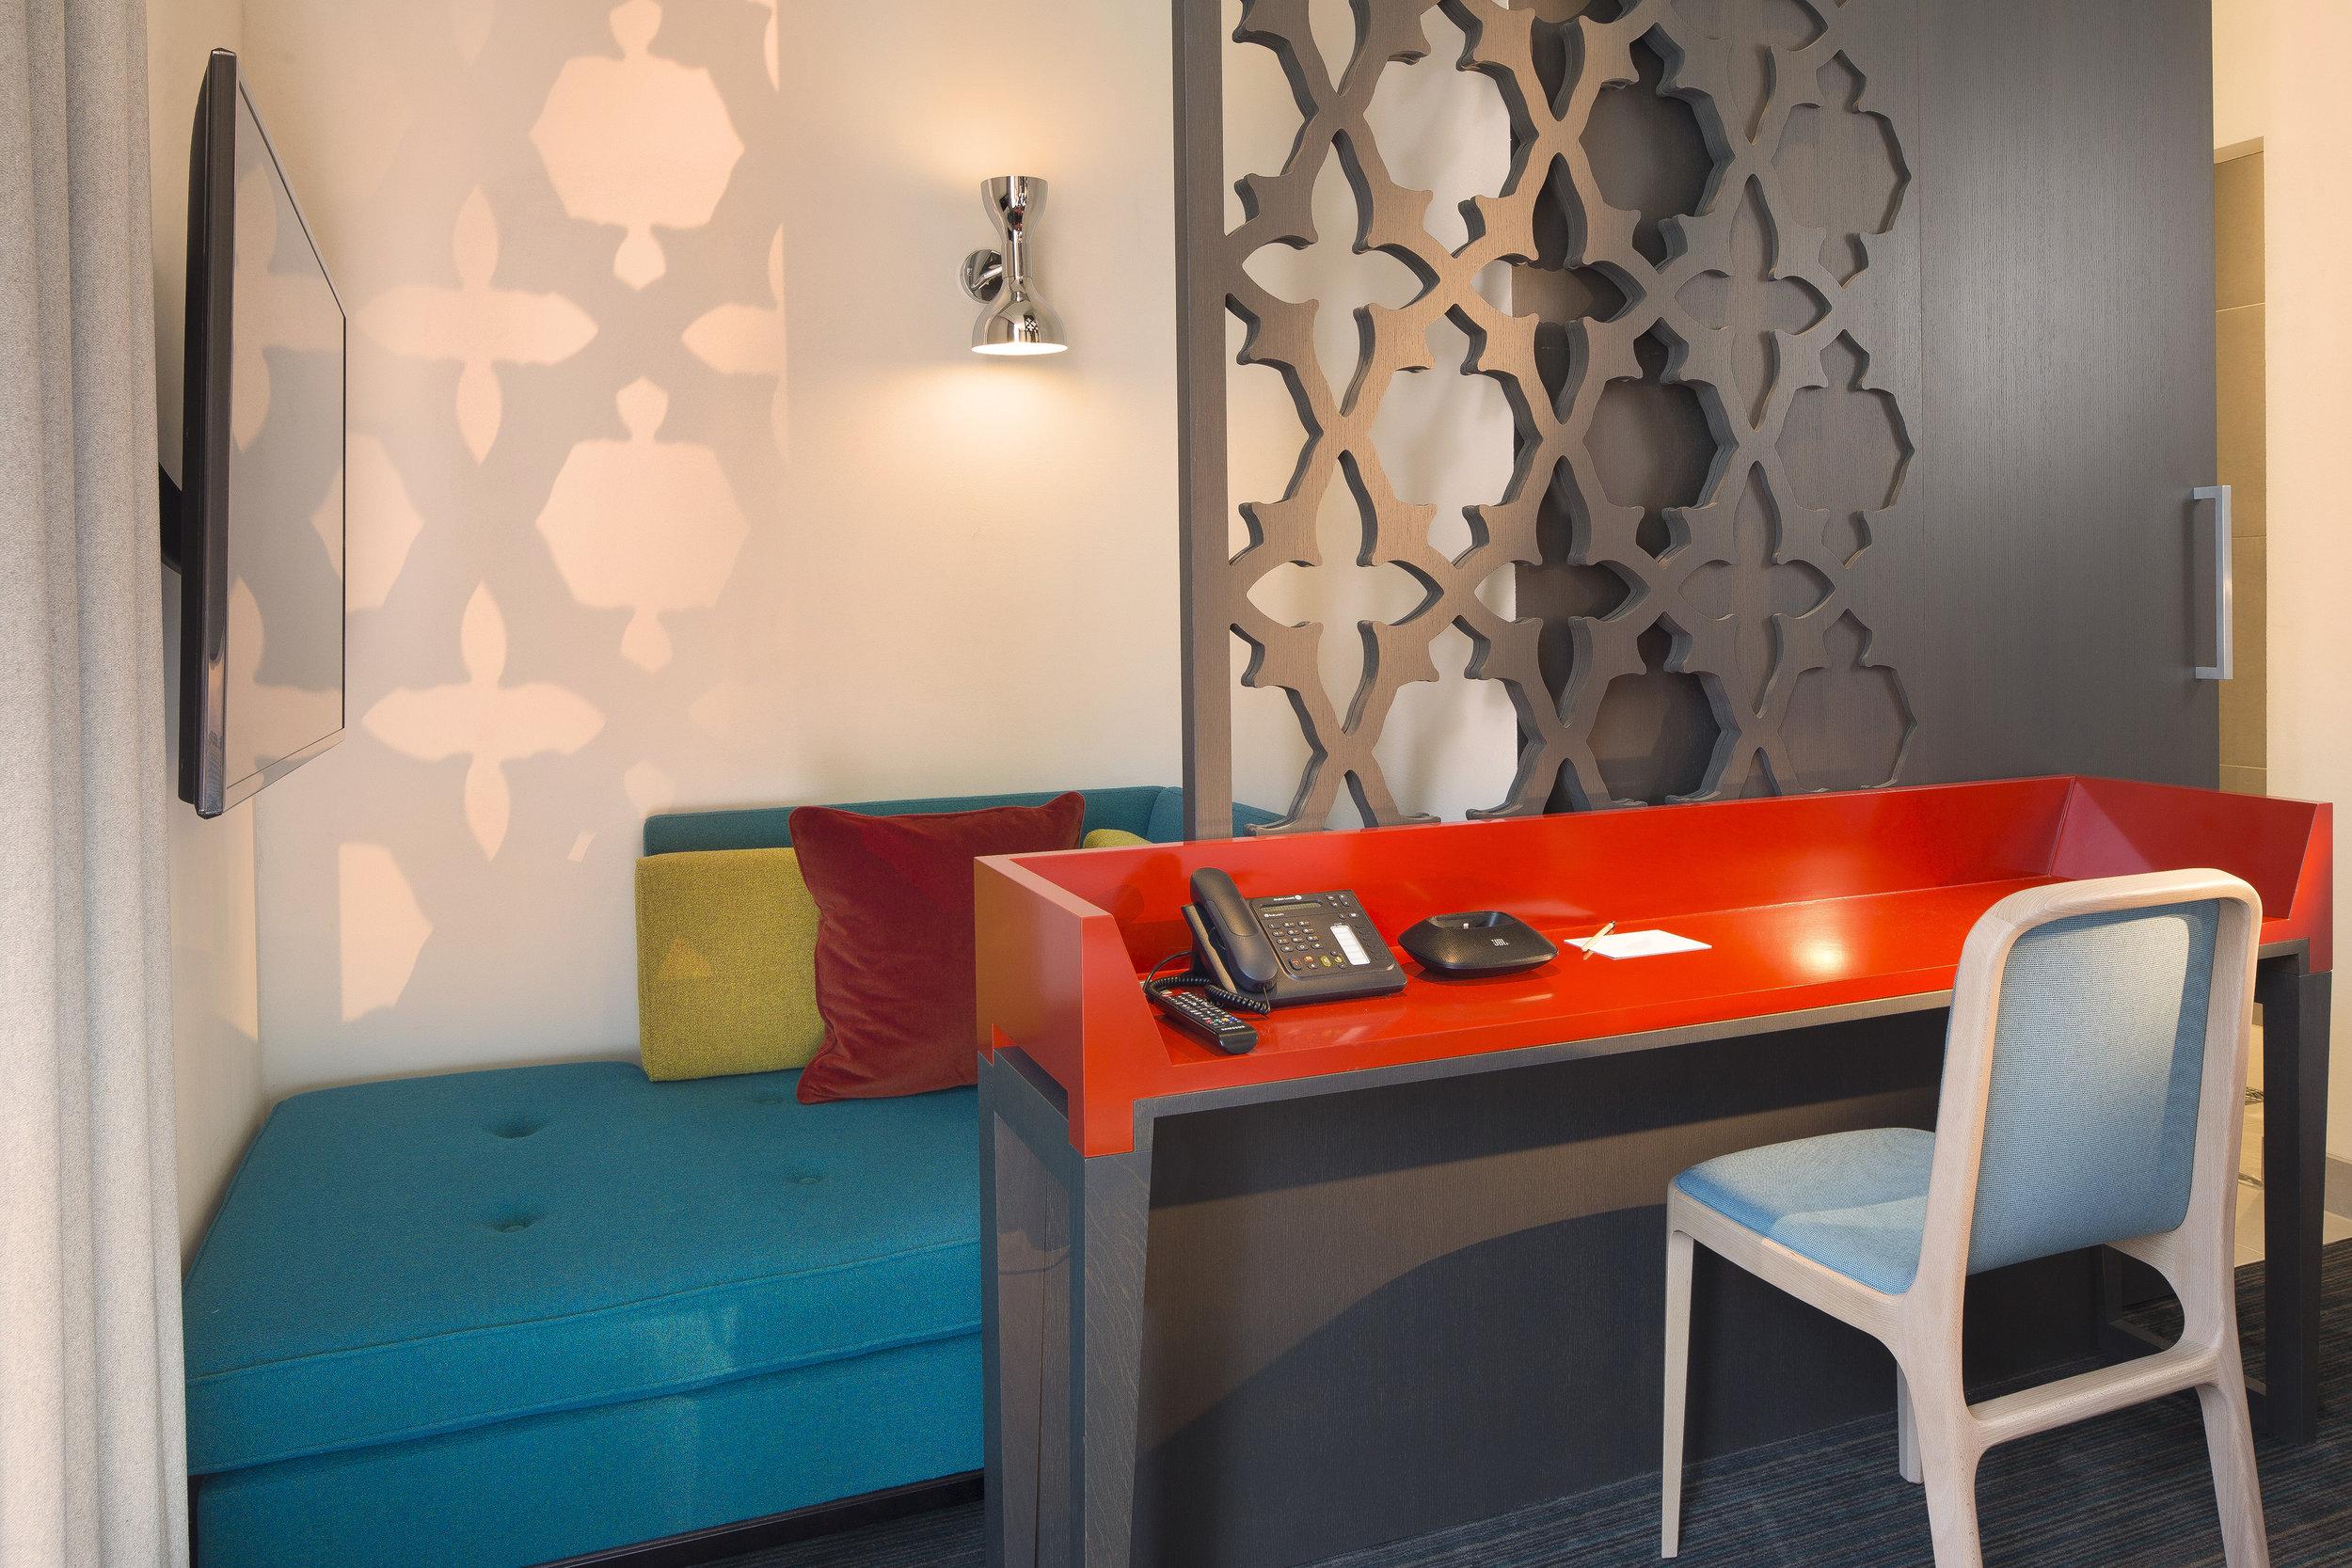 hotel-d-strasbourg-photo-christophe bielsa-chambre-deluxe-25 md.jpg